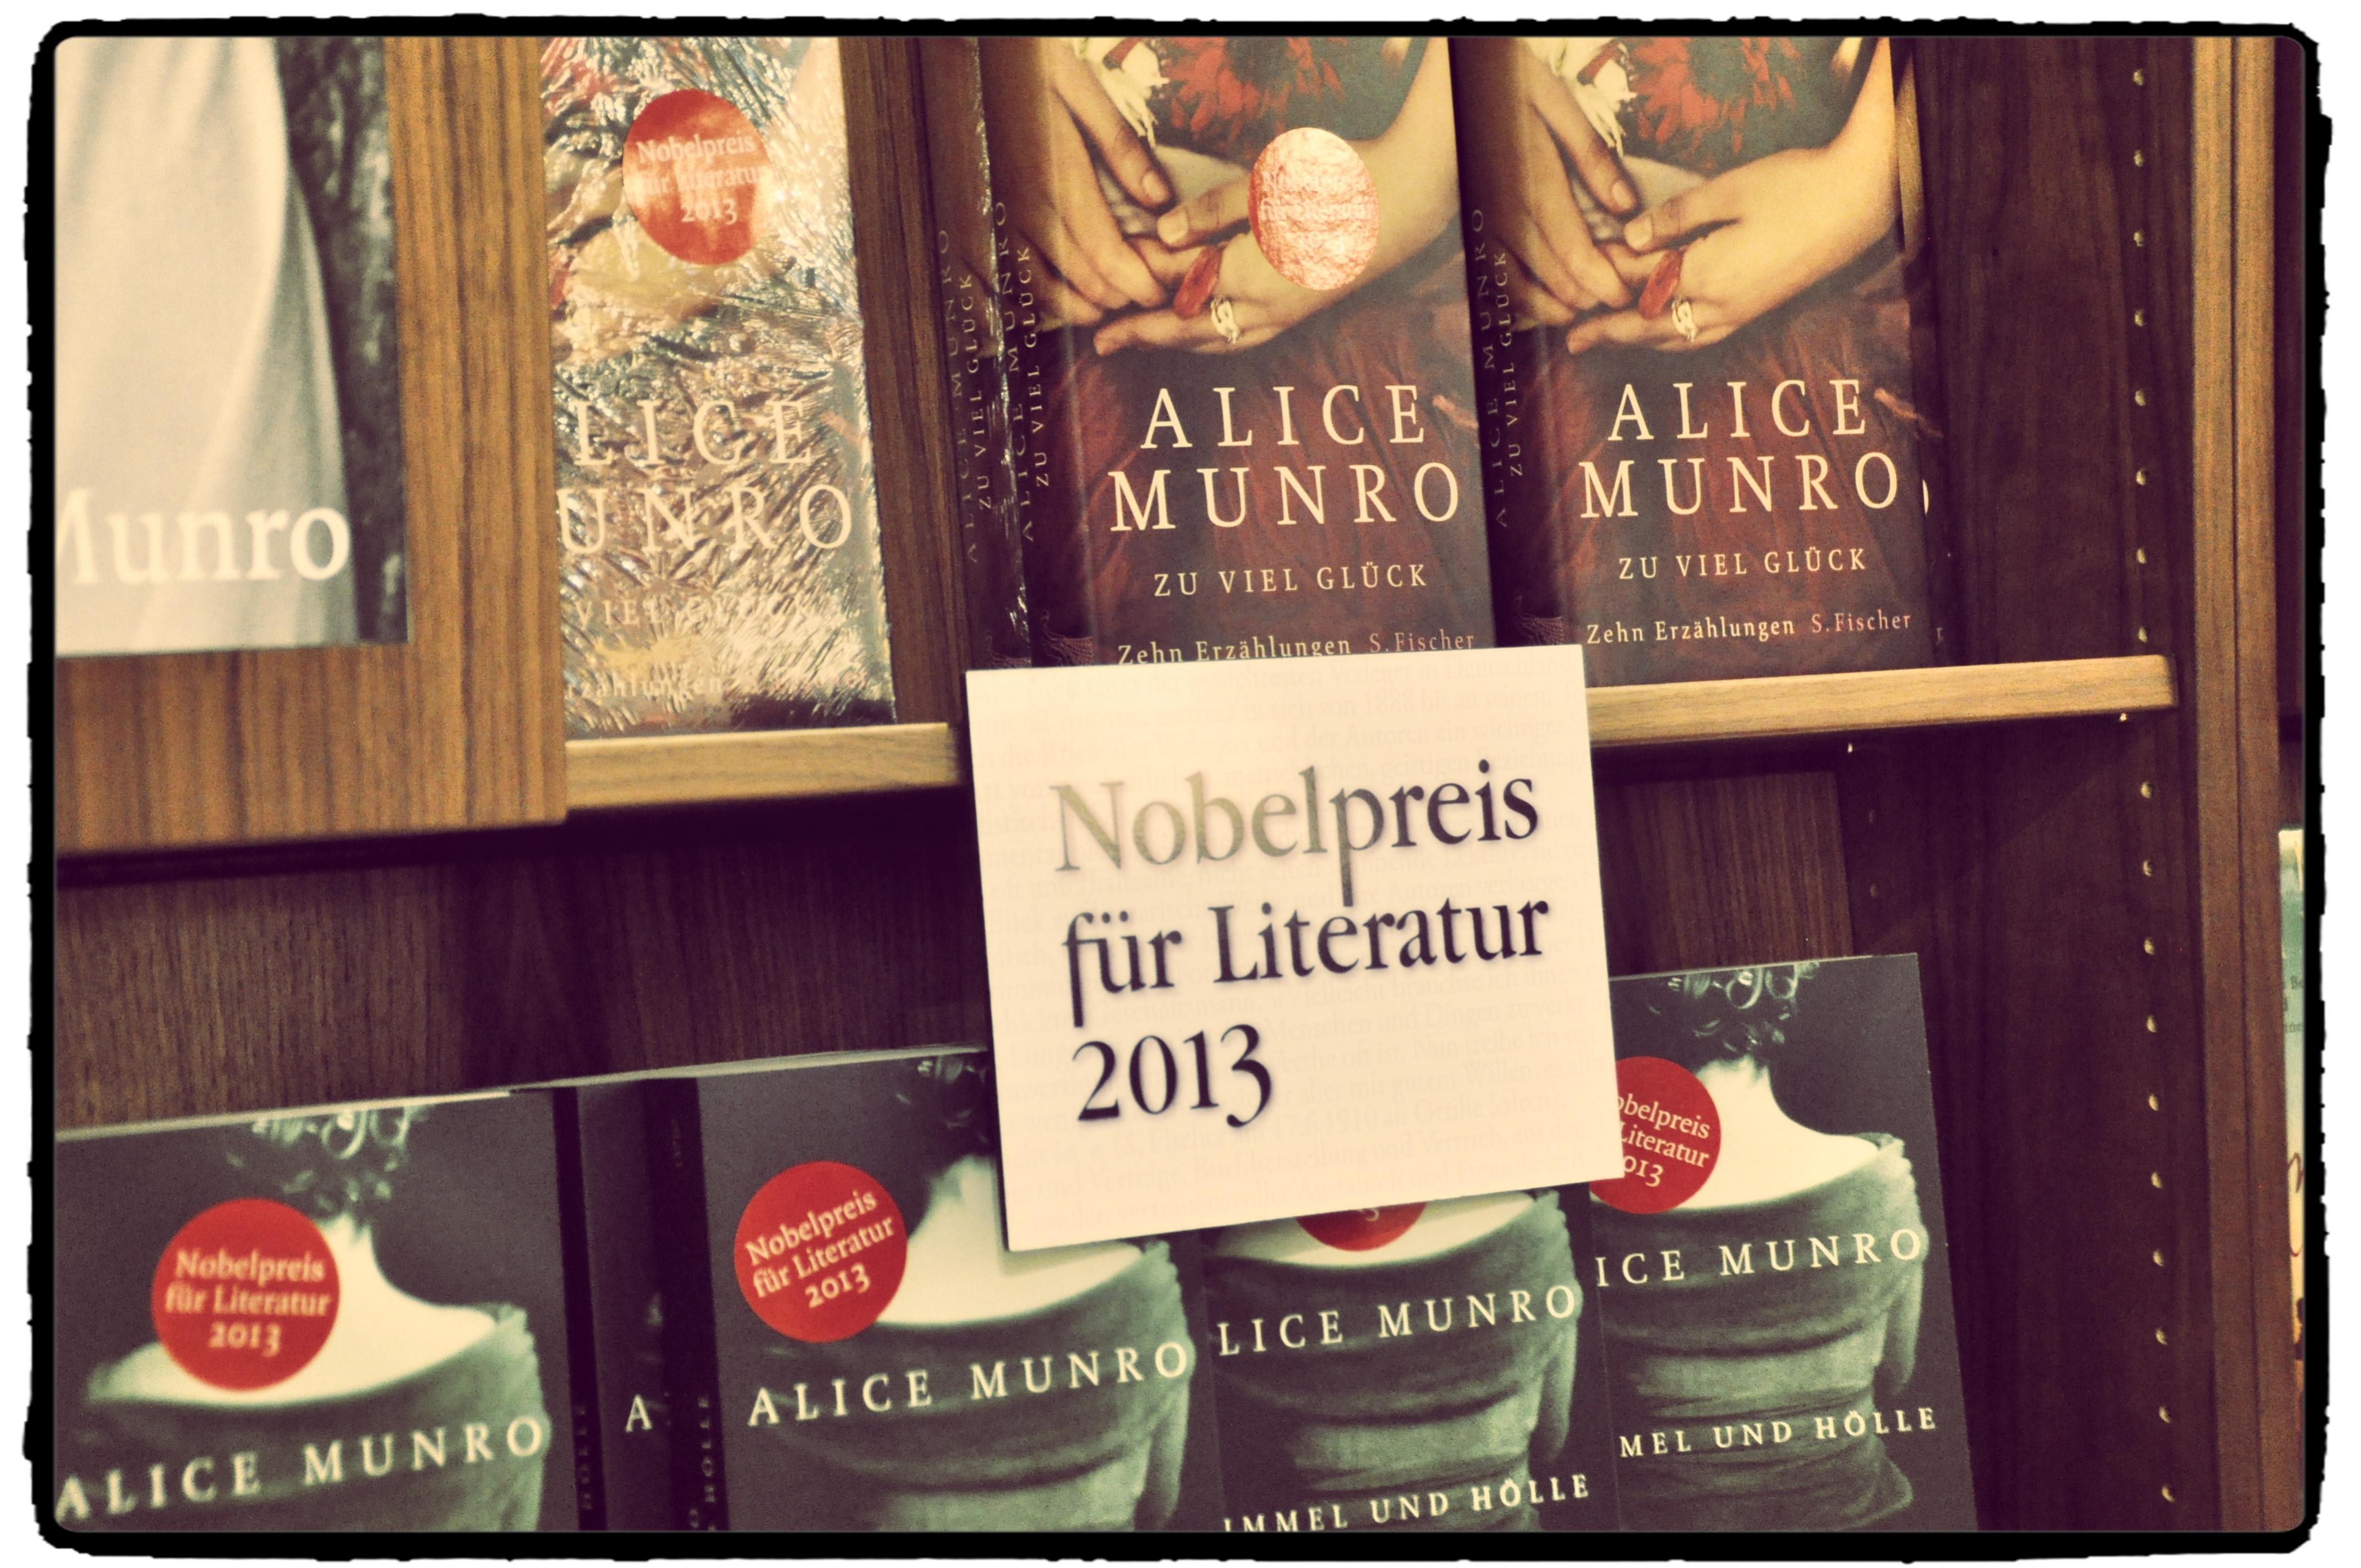 Alice Munro Nobelpreis